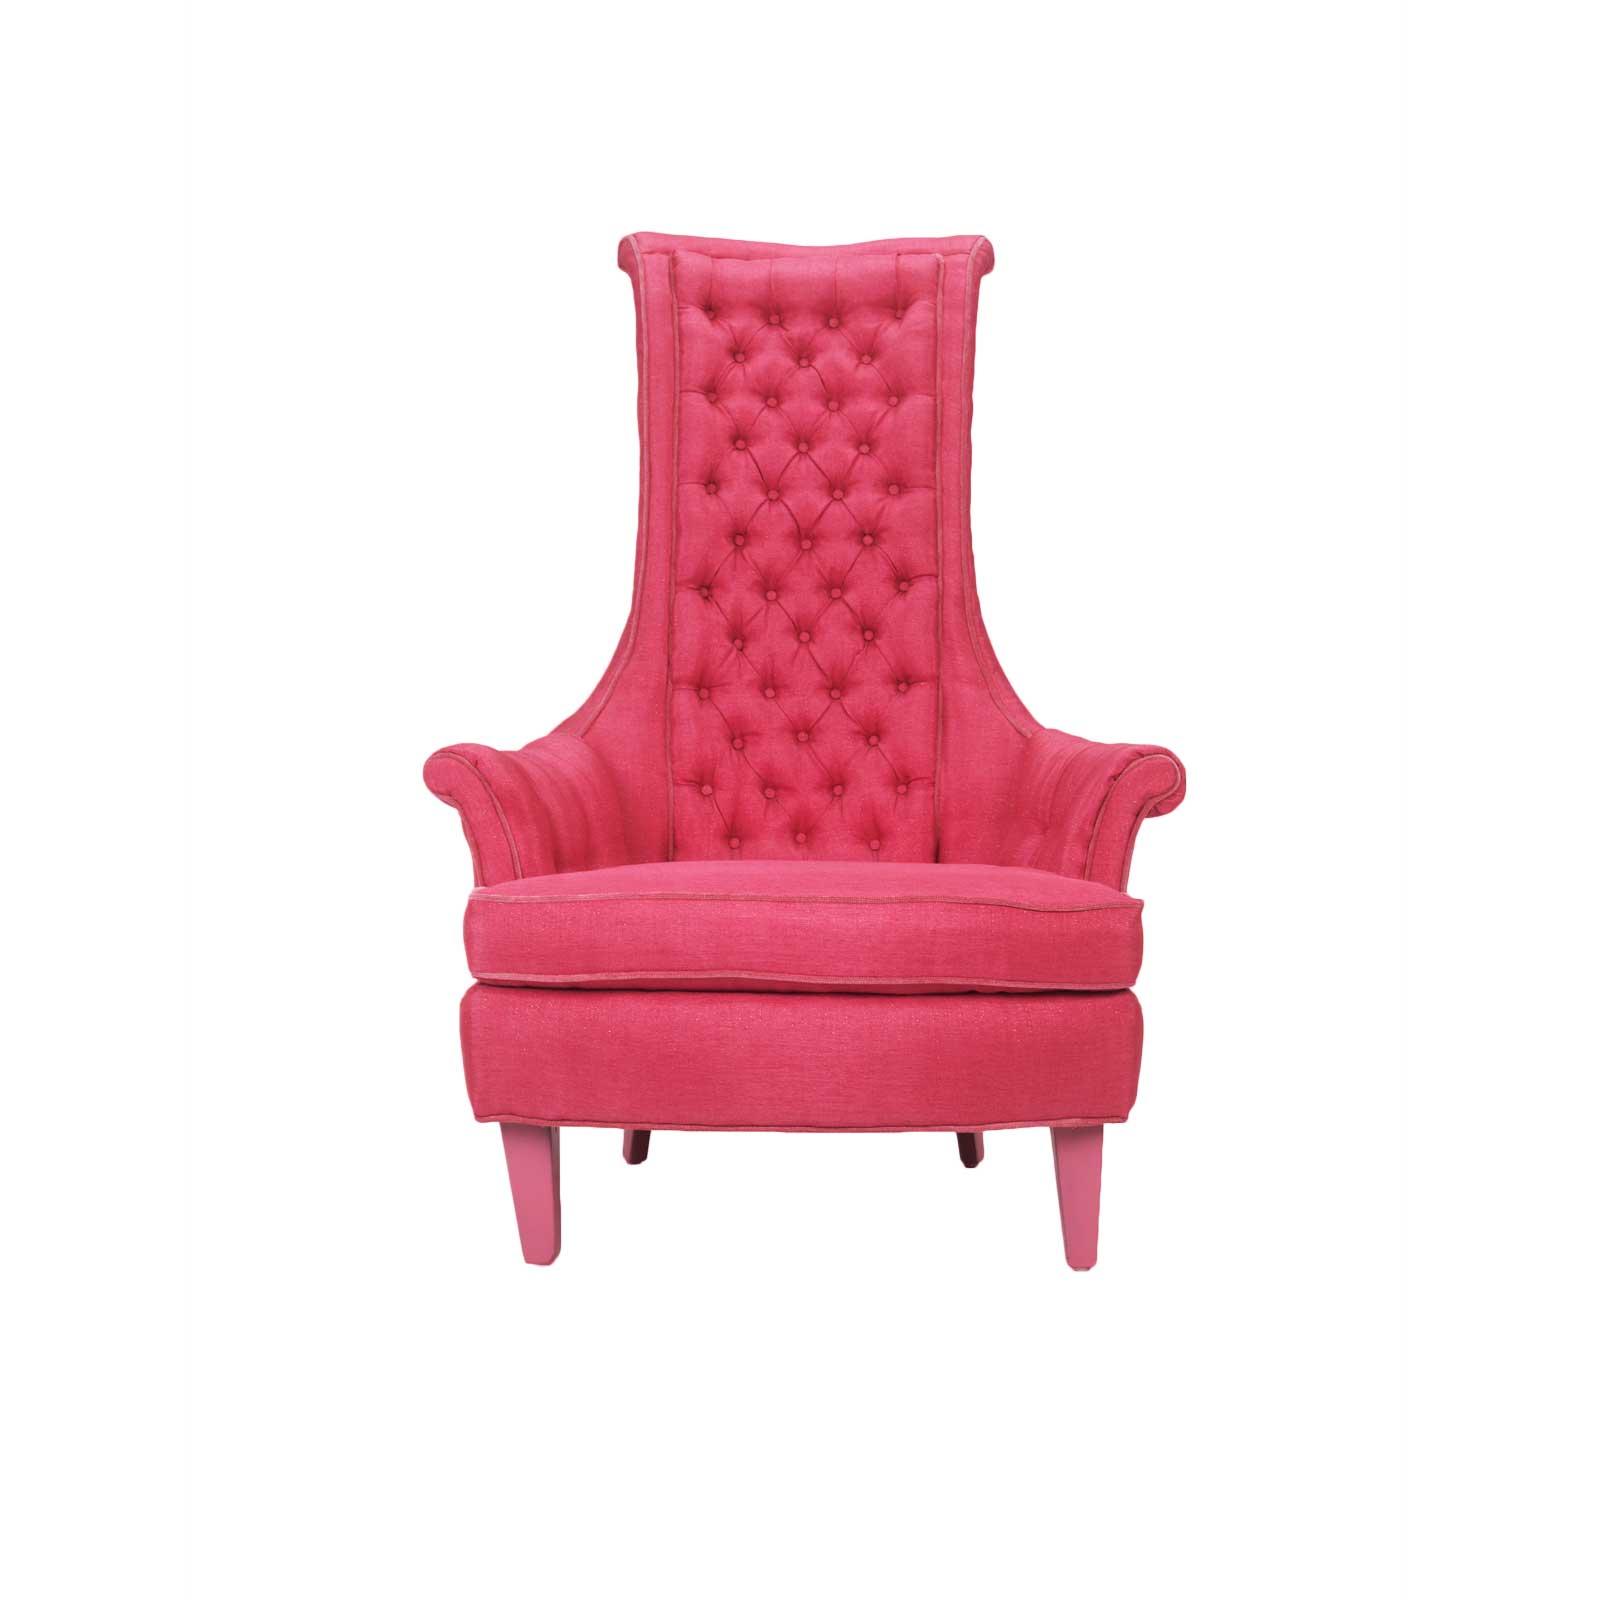 Pink Lounge Chair Rentals Event Furniture Rental